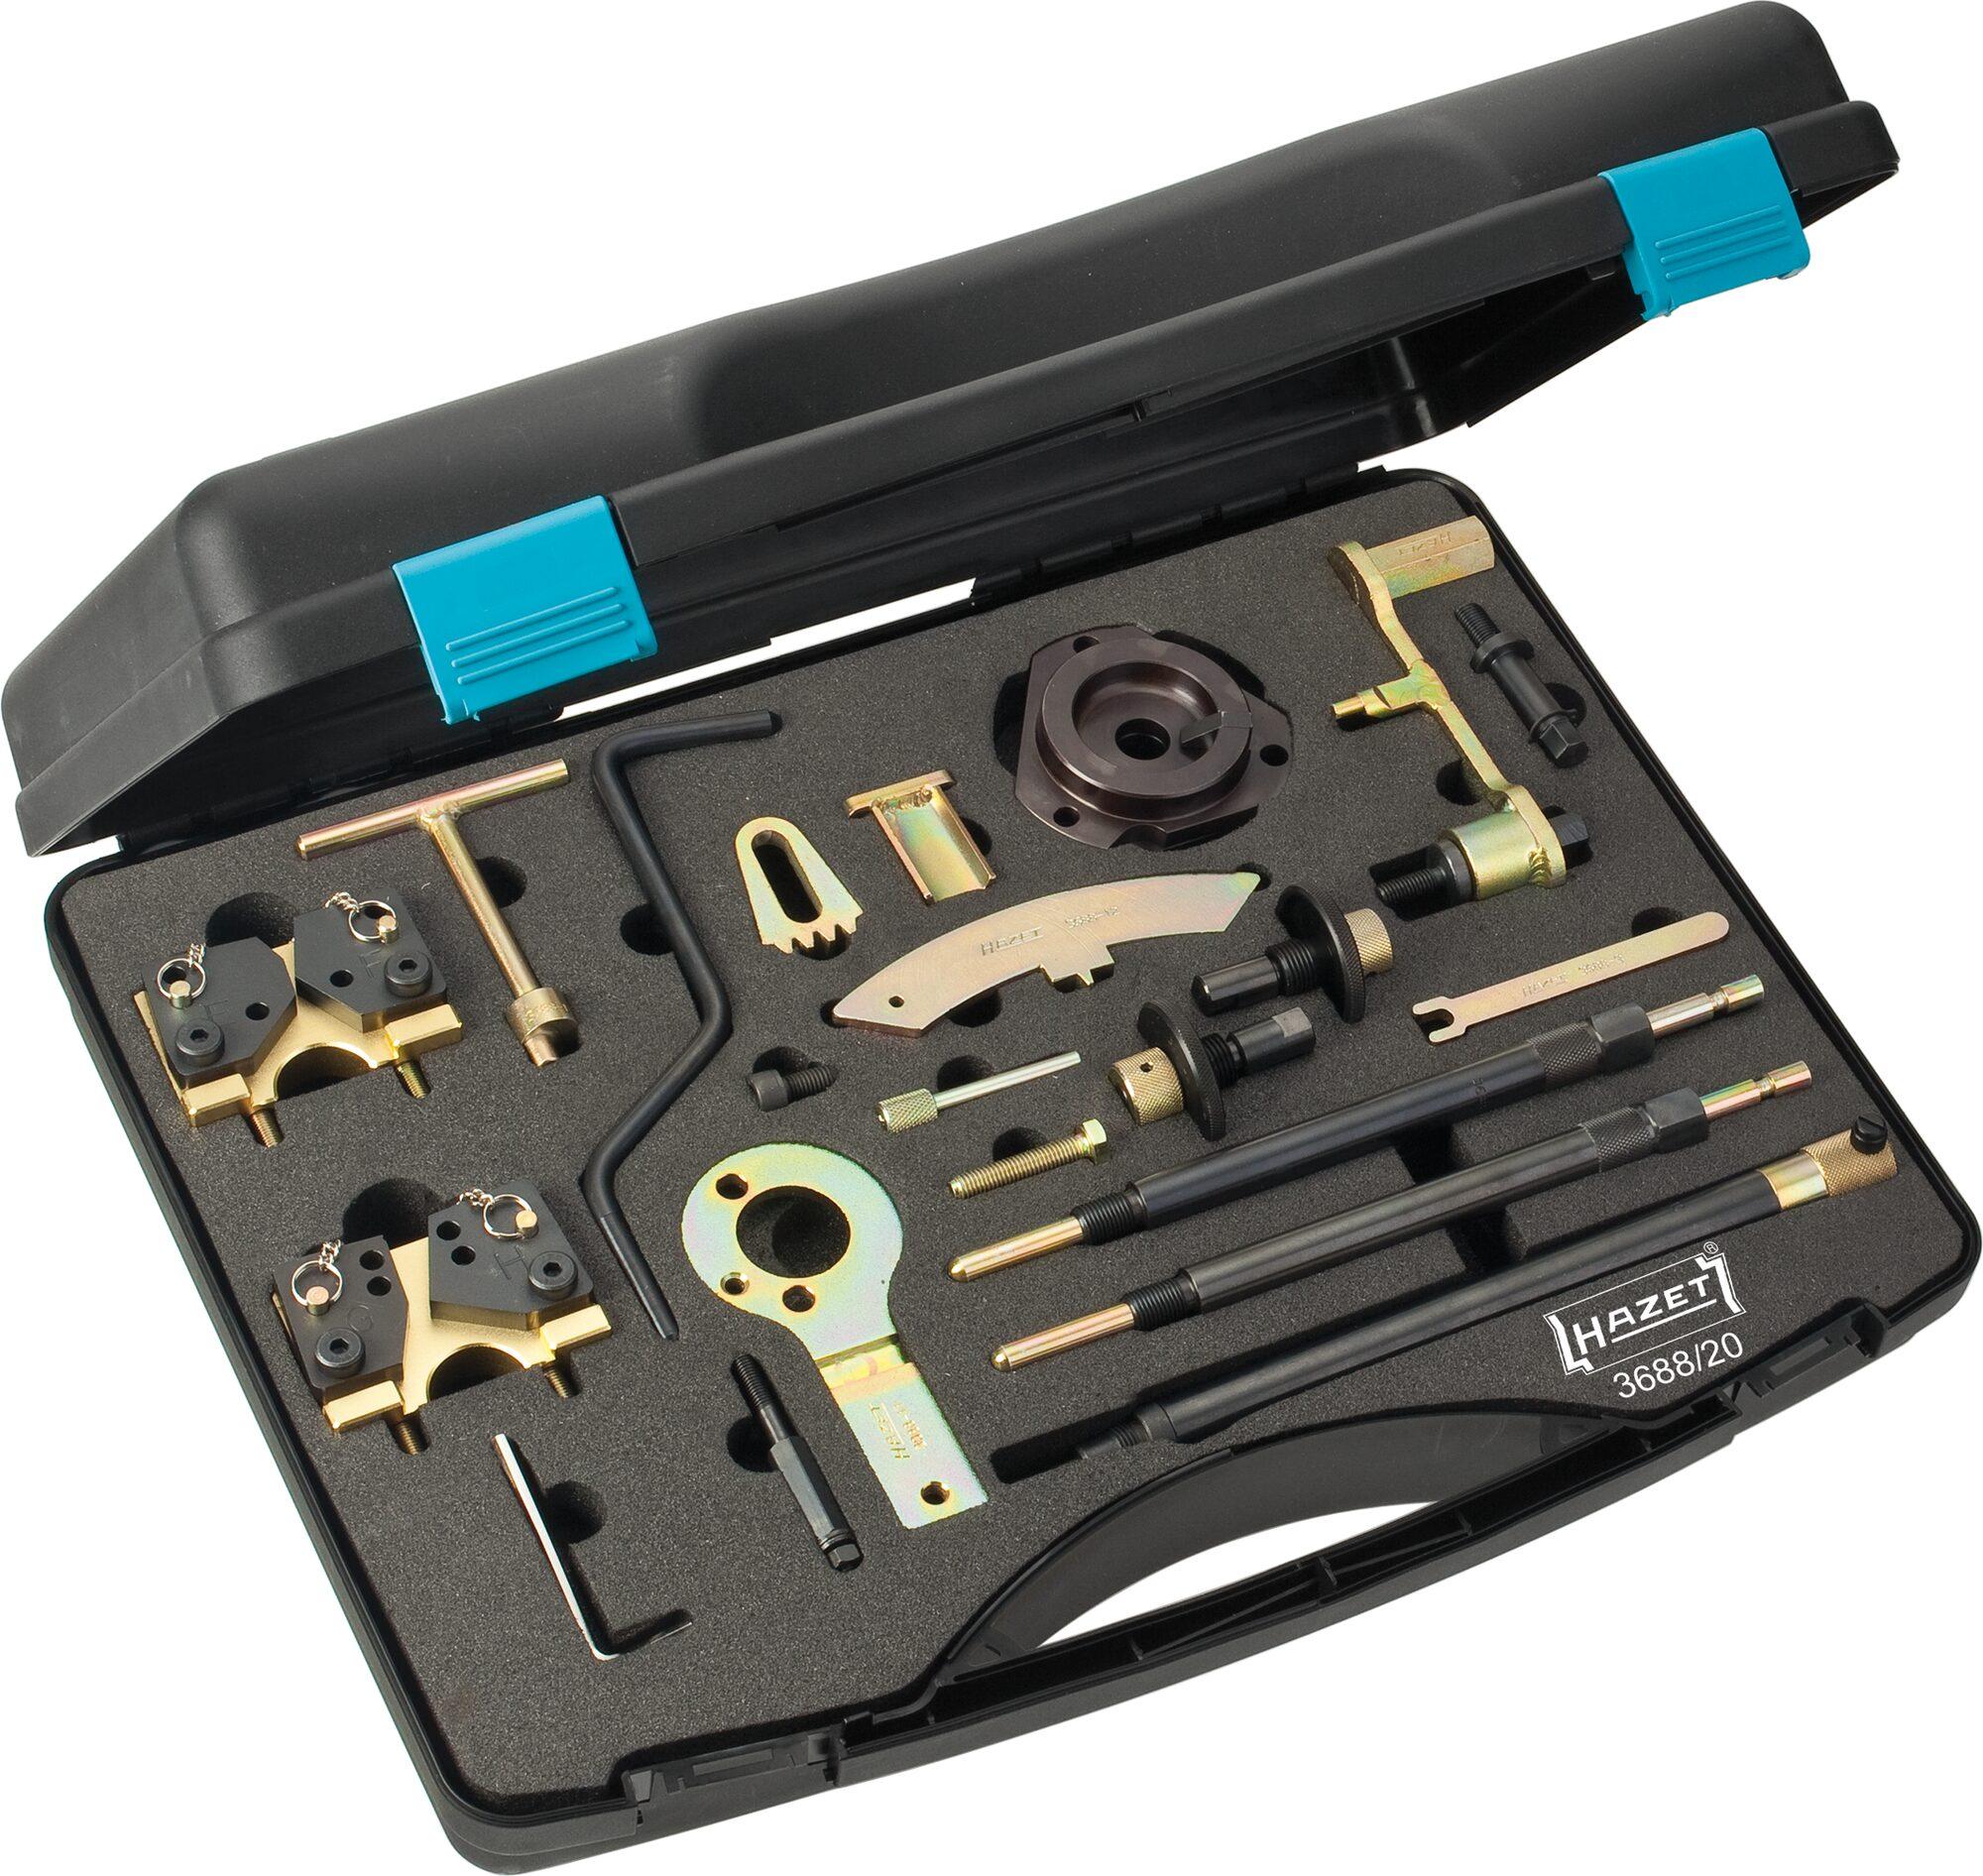 HAZET Fixierwerkzeug 3688-2